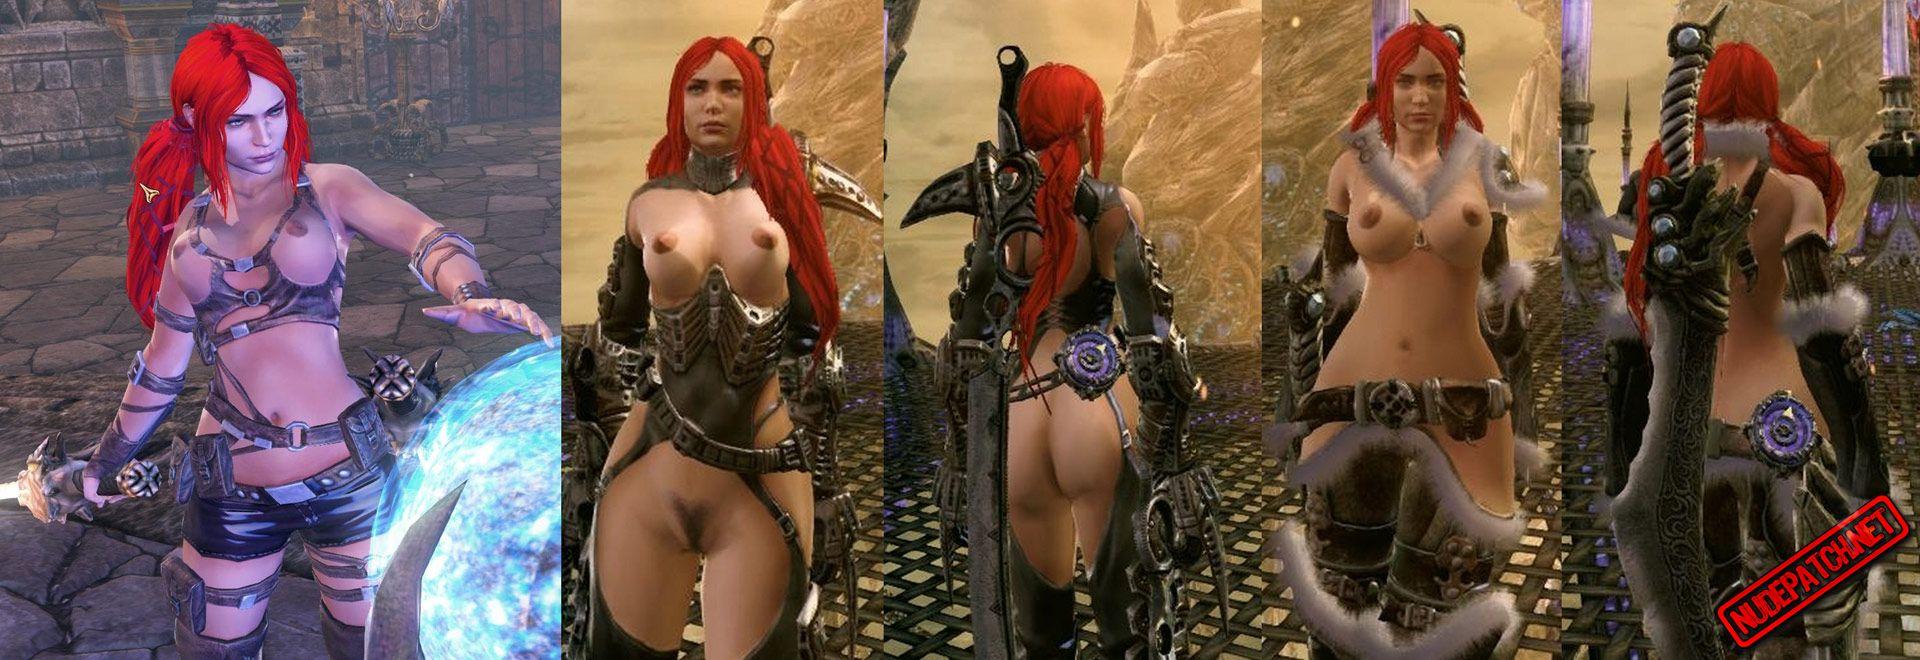 Borderlands Nude Mod Complete blades of time nude mod – heavenly sword